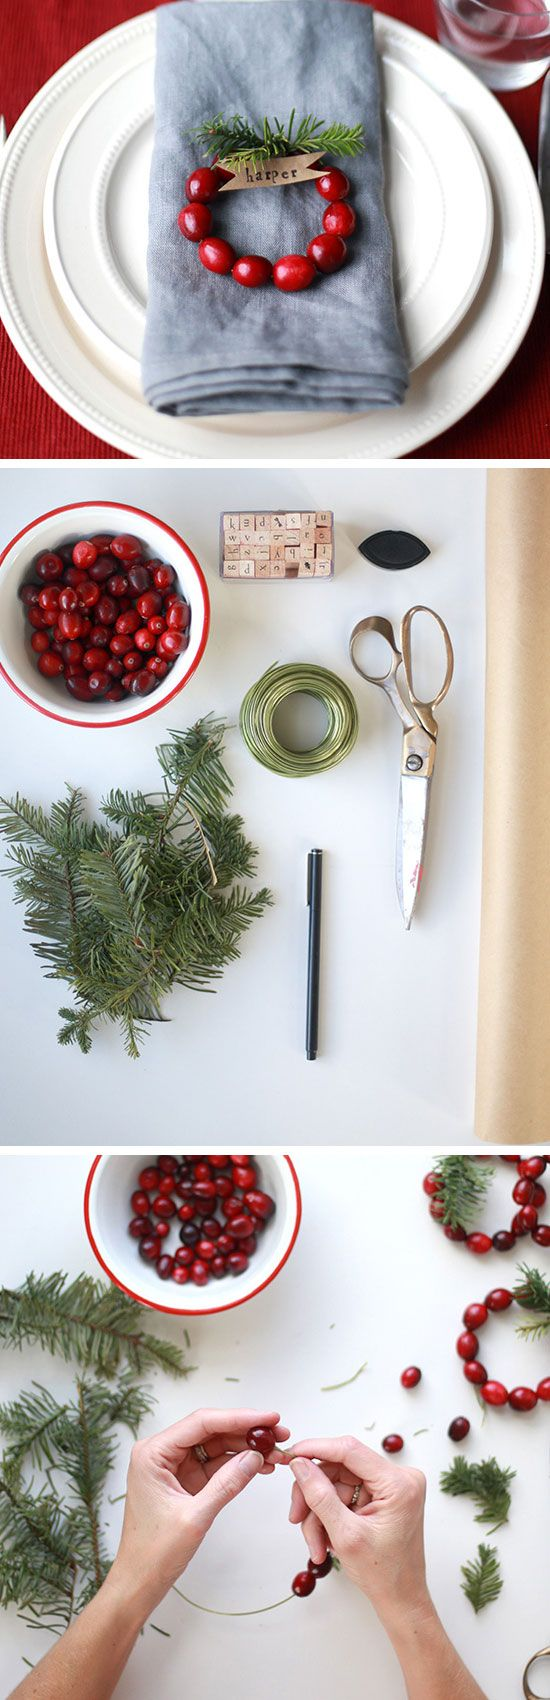 DIY Mini Cranberry Wreath Place Cards | Click Pic for 18 DIY Christmas Table Centerpiece Ideas | DIY Christmas Table Decoration Ideas